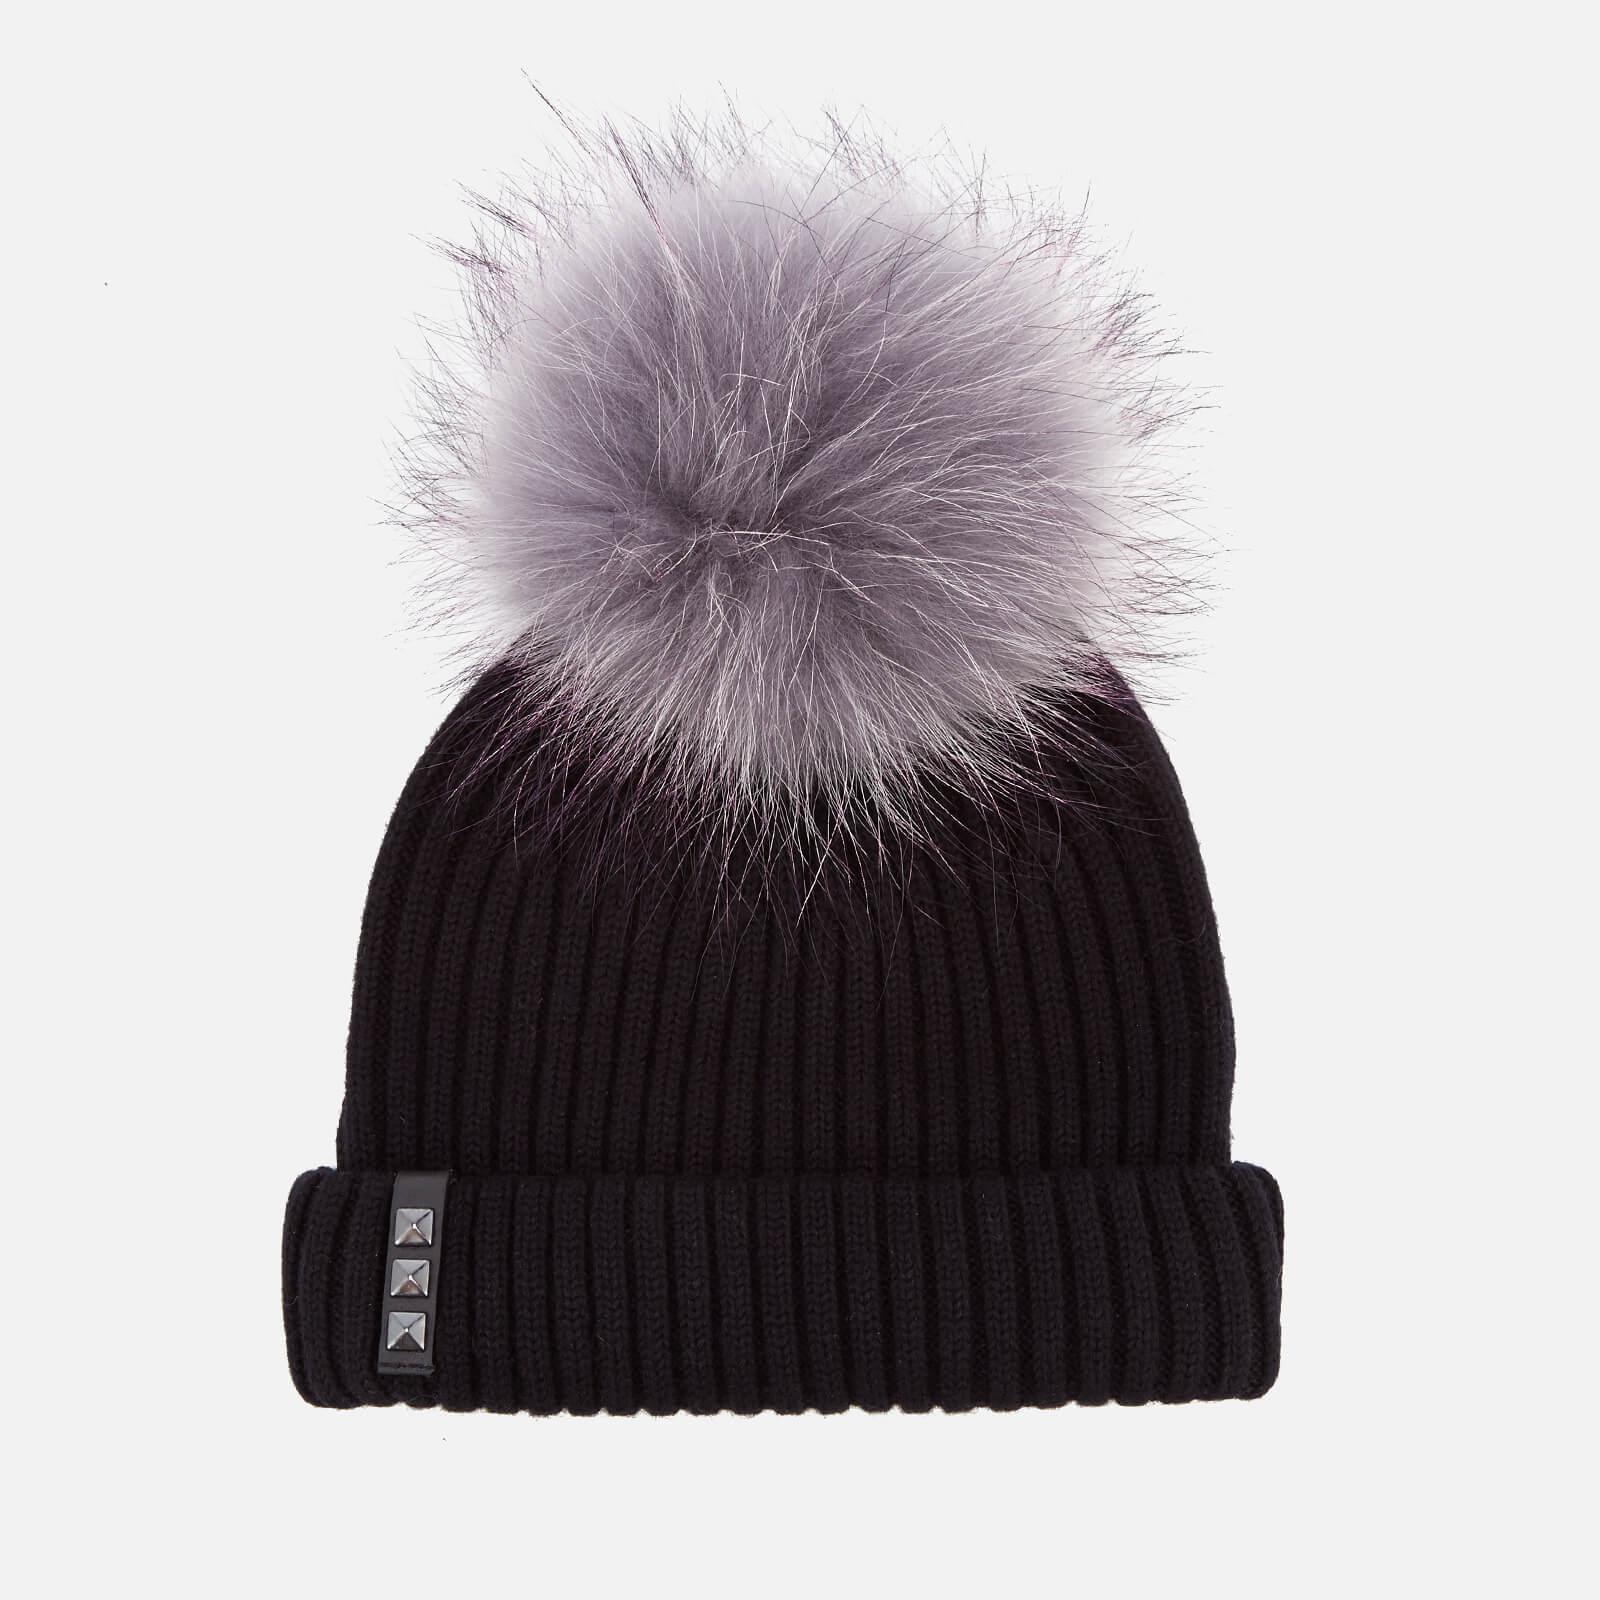 33ae7c2ffba BKLYN Women s Merino Wool Hat with Grey Purple Pom Pom - Black Womens  Accessories